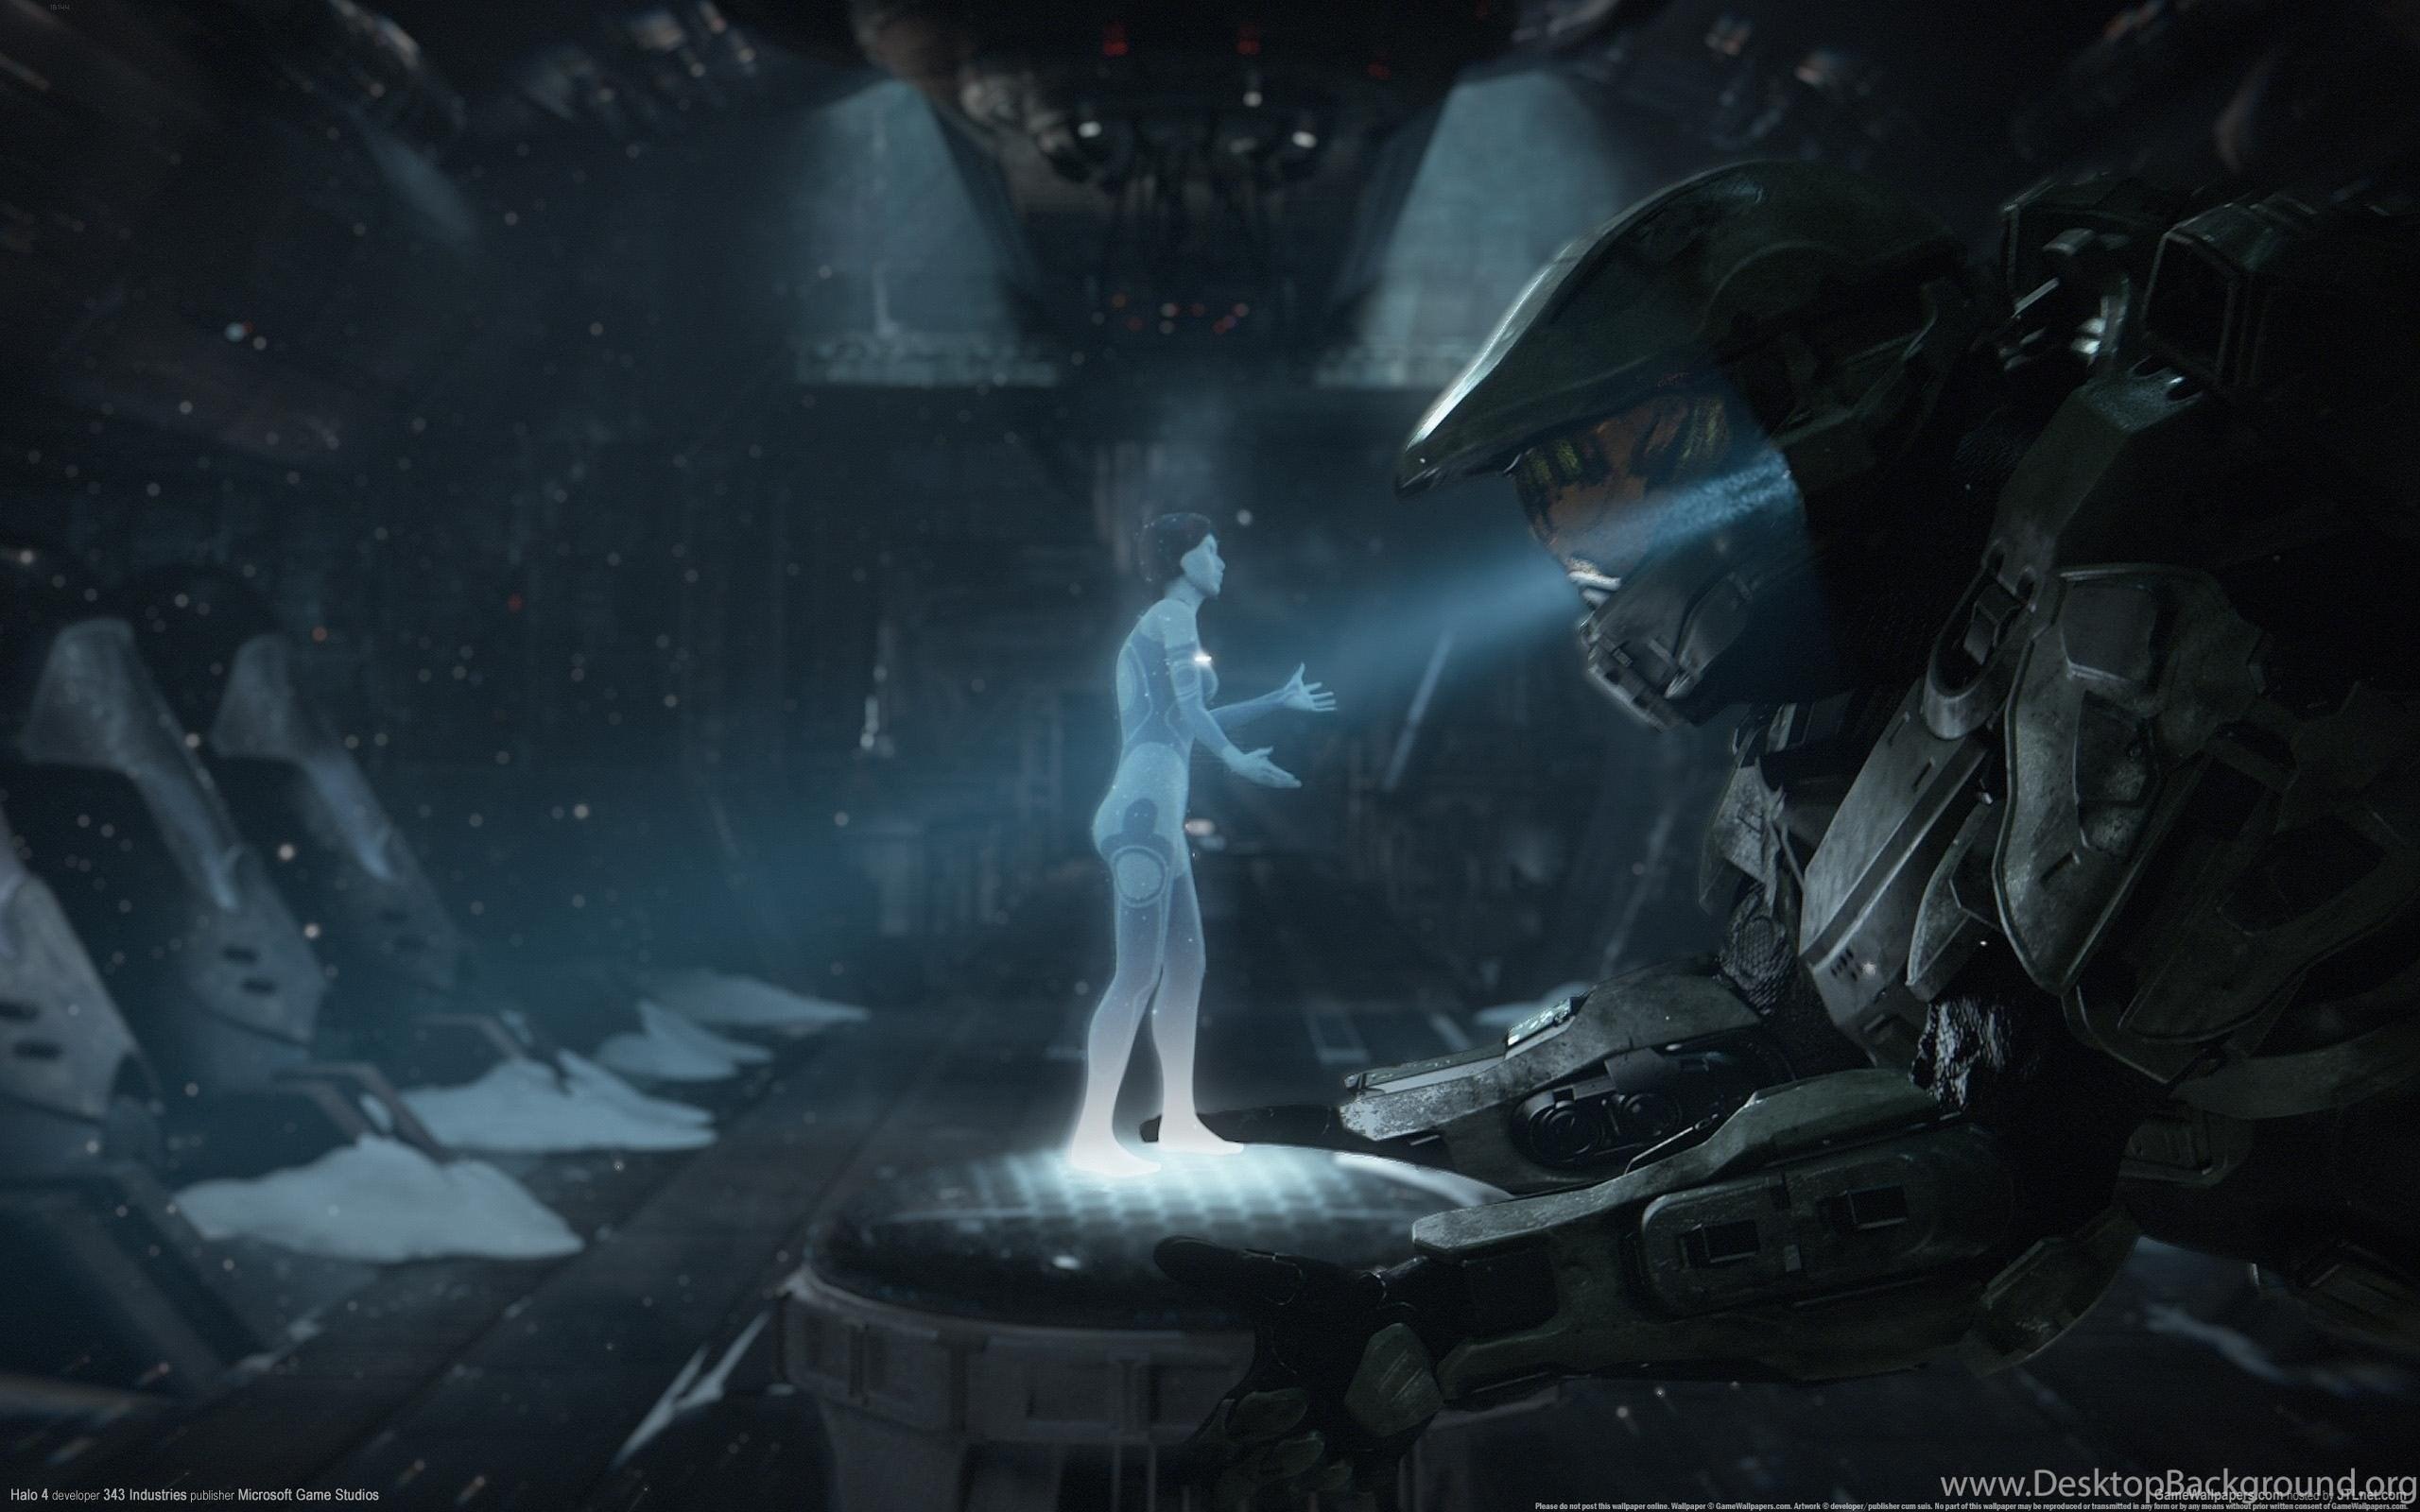 Halo 4 Forward Unto Dawn Wallpapers Hd Wallpapers Desktop Background